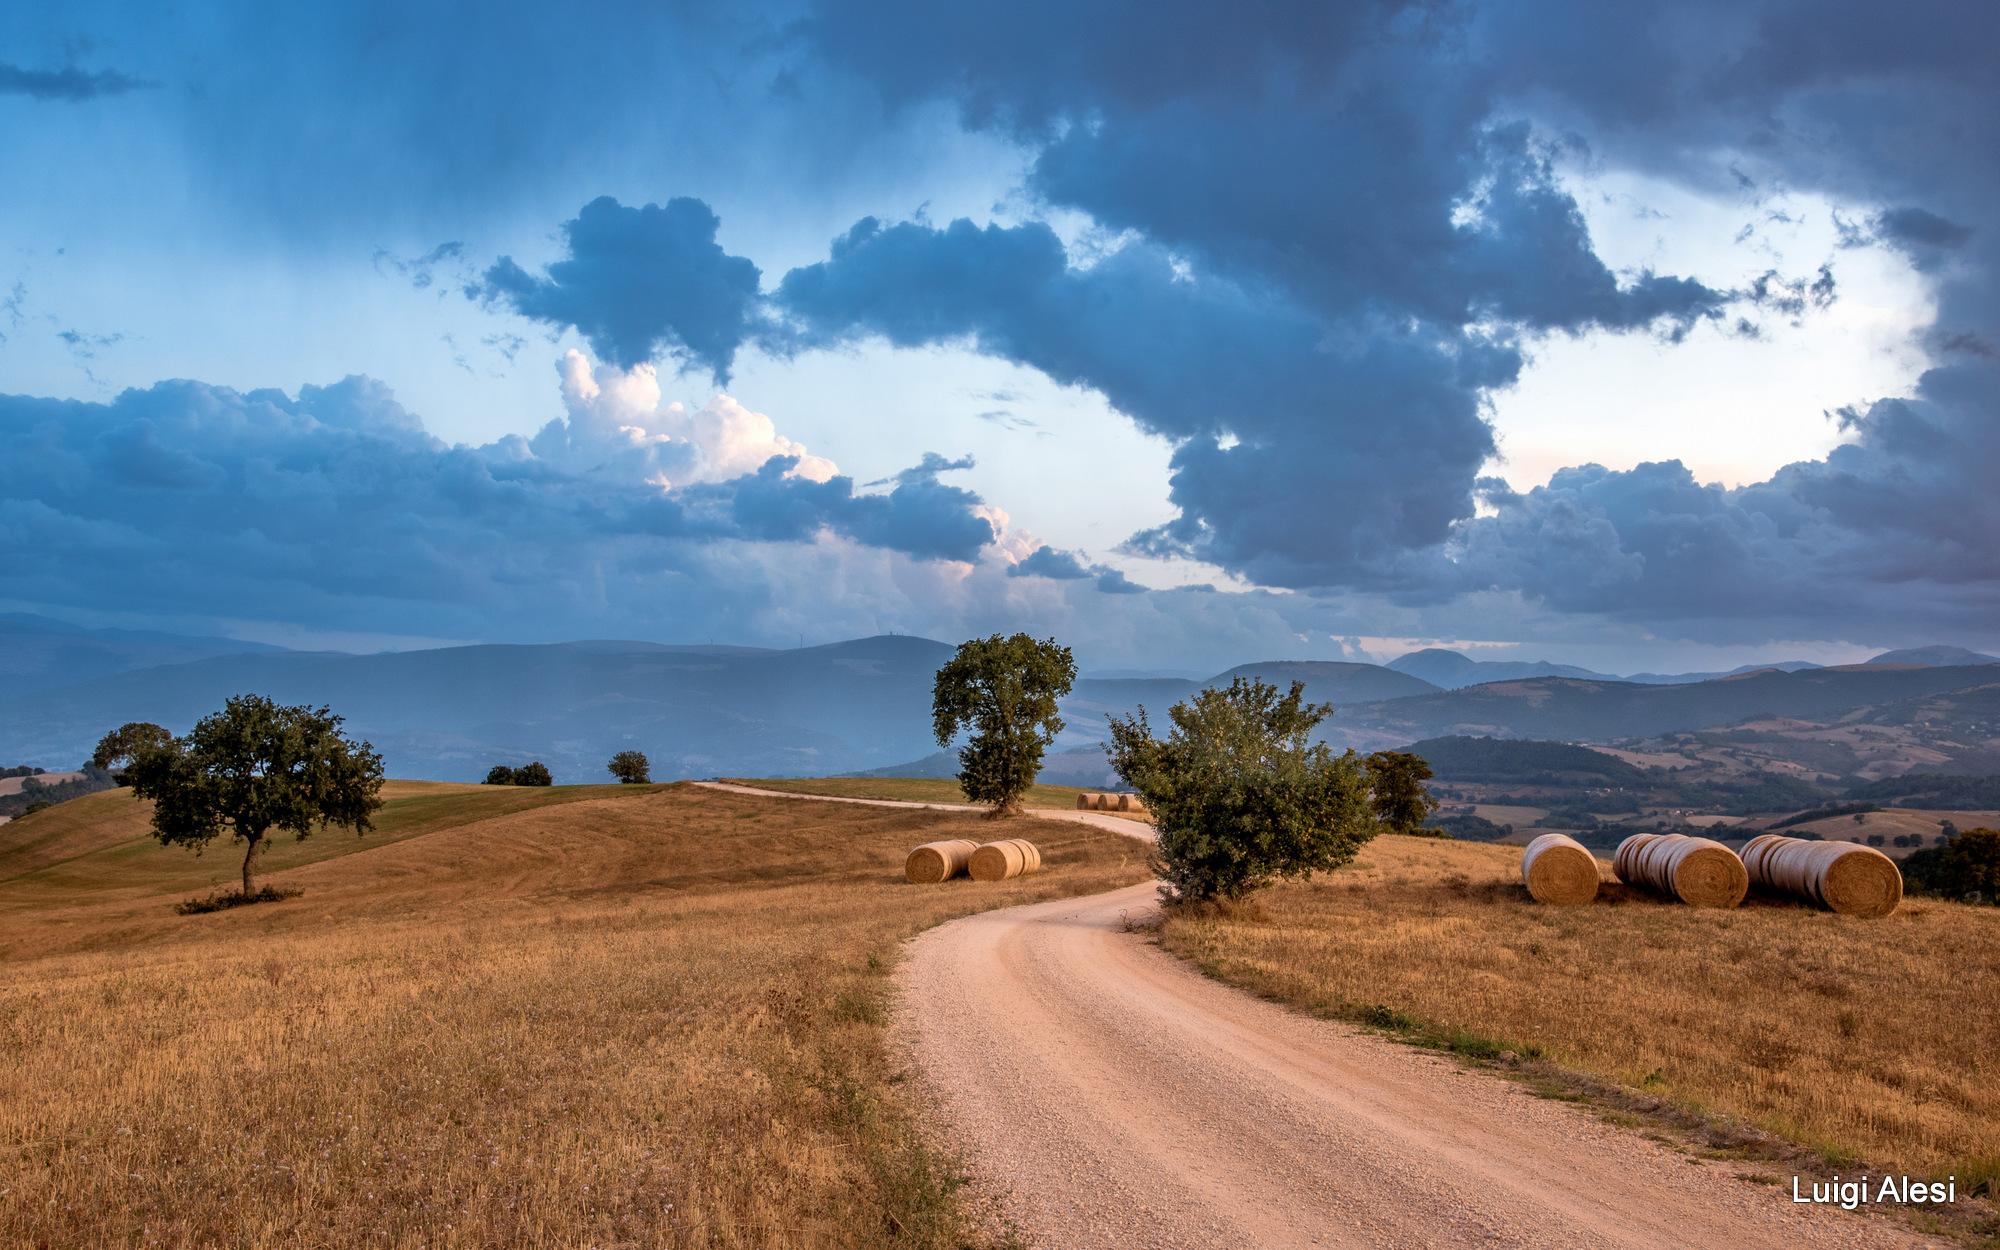 San Severino Marche countryside, Italy